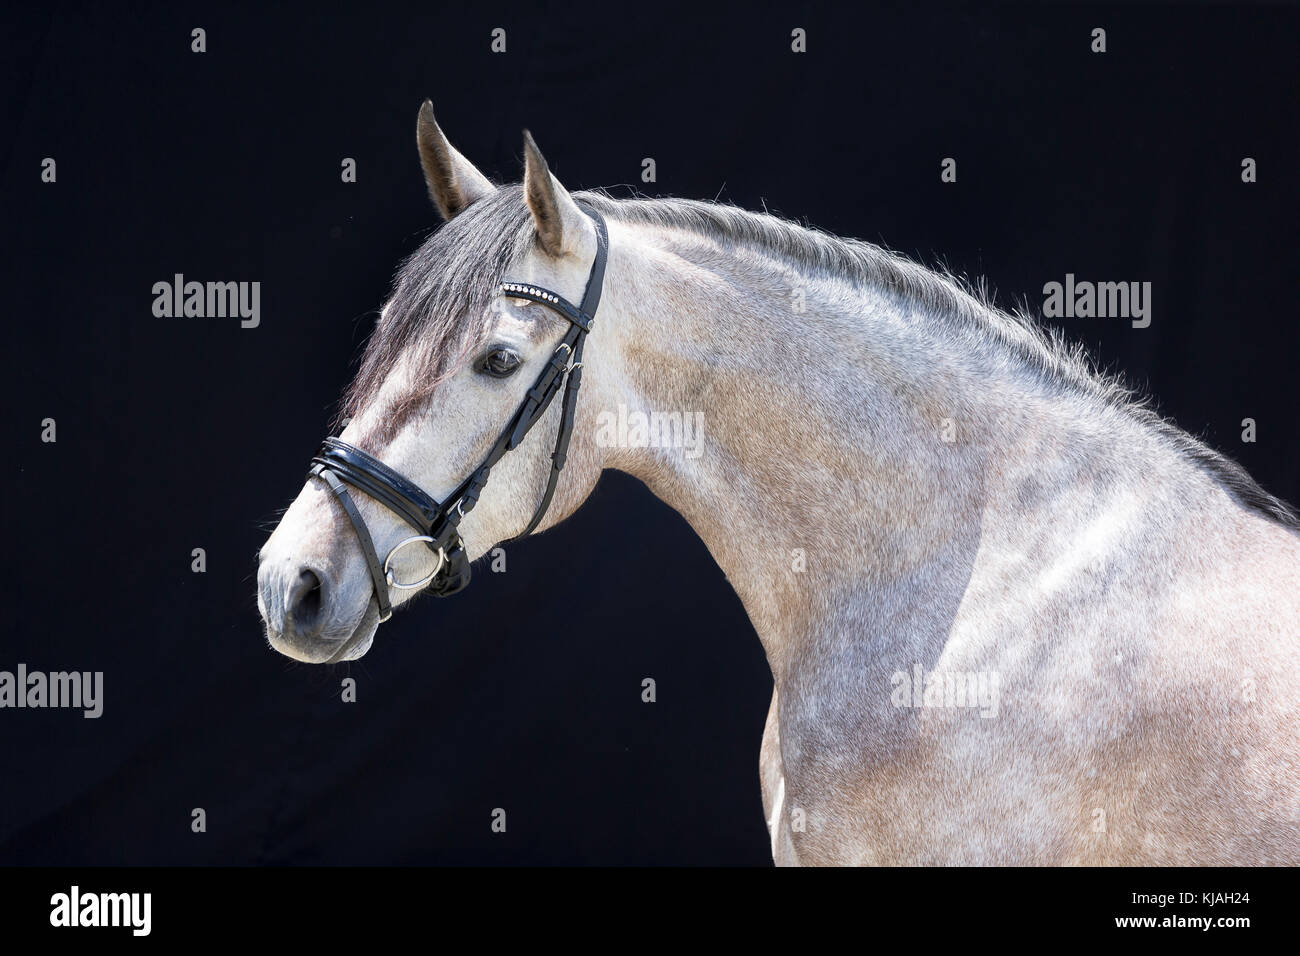 Strawberry Roan Horse Stock Photos & Strawberry Roan Horse ... - photo#41